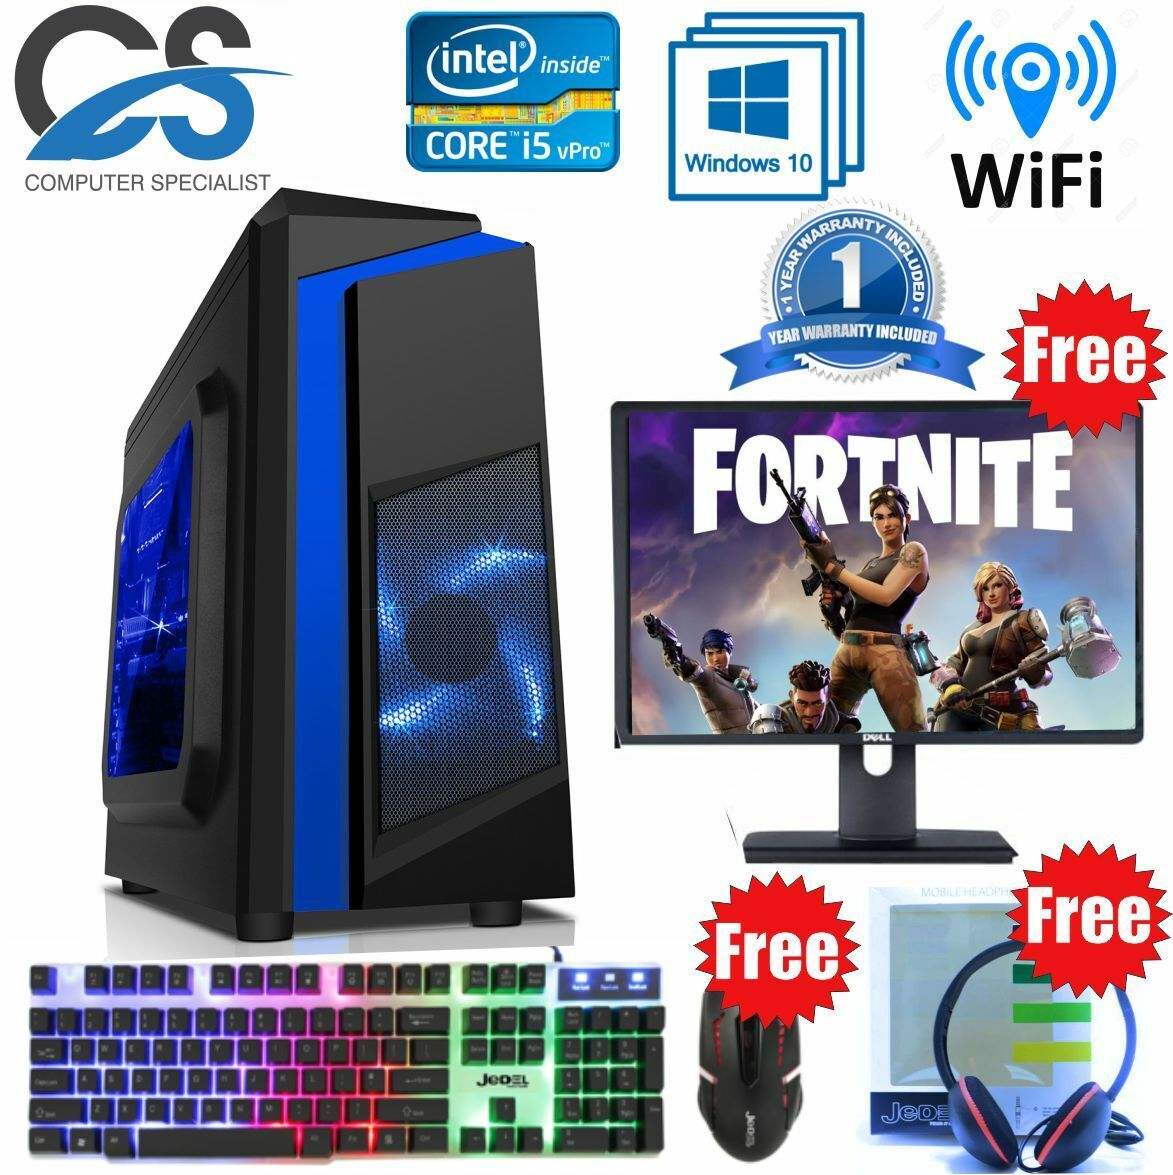 Computer Games - Gaming PC Computer Bundle Intel Quad Core i5 16GB 1TB Windows 10 4GB GTX 1050Ti